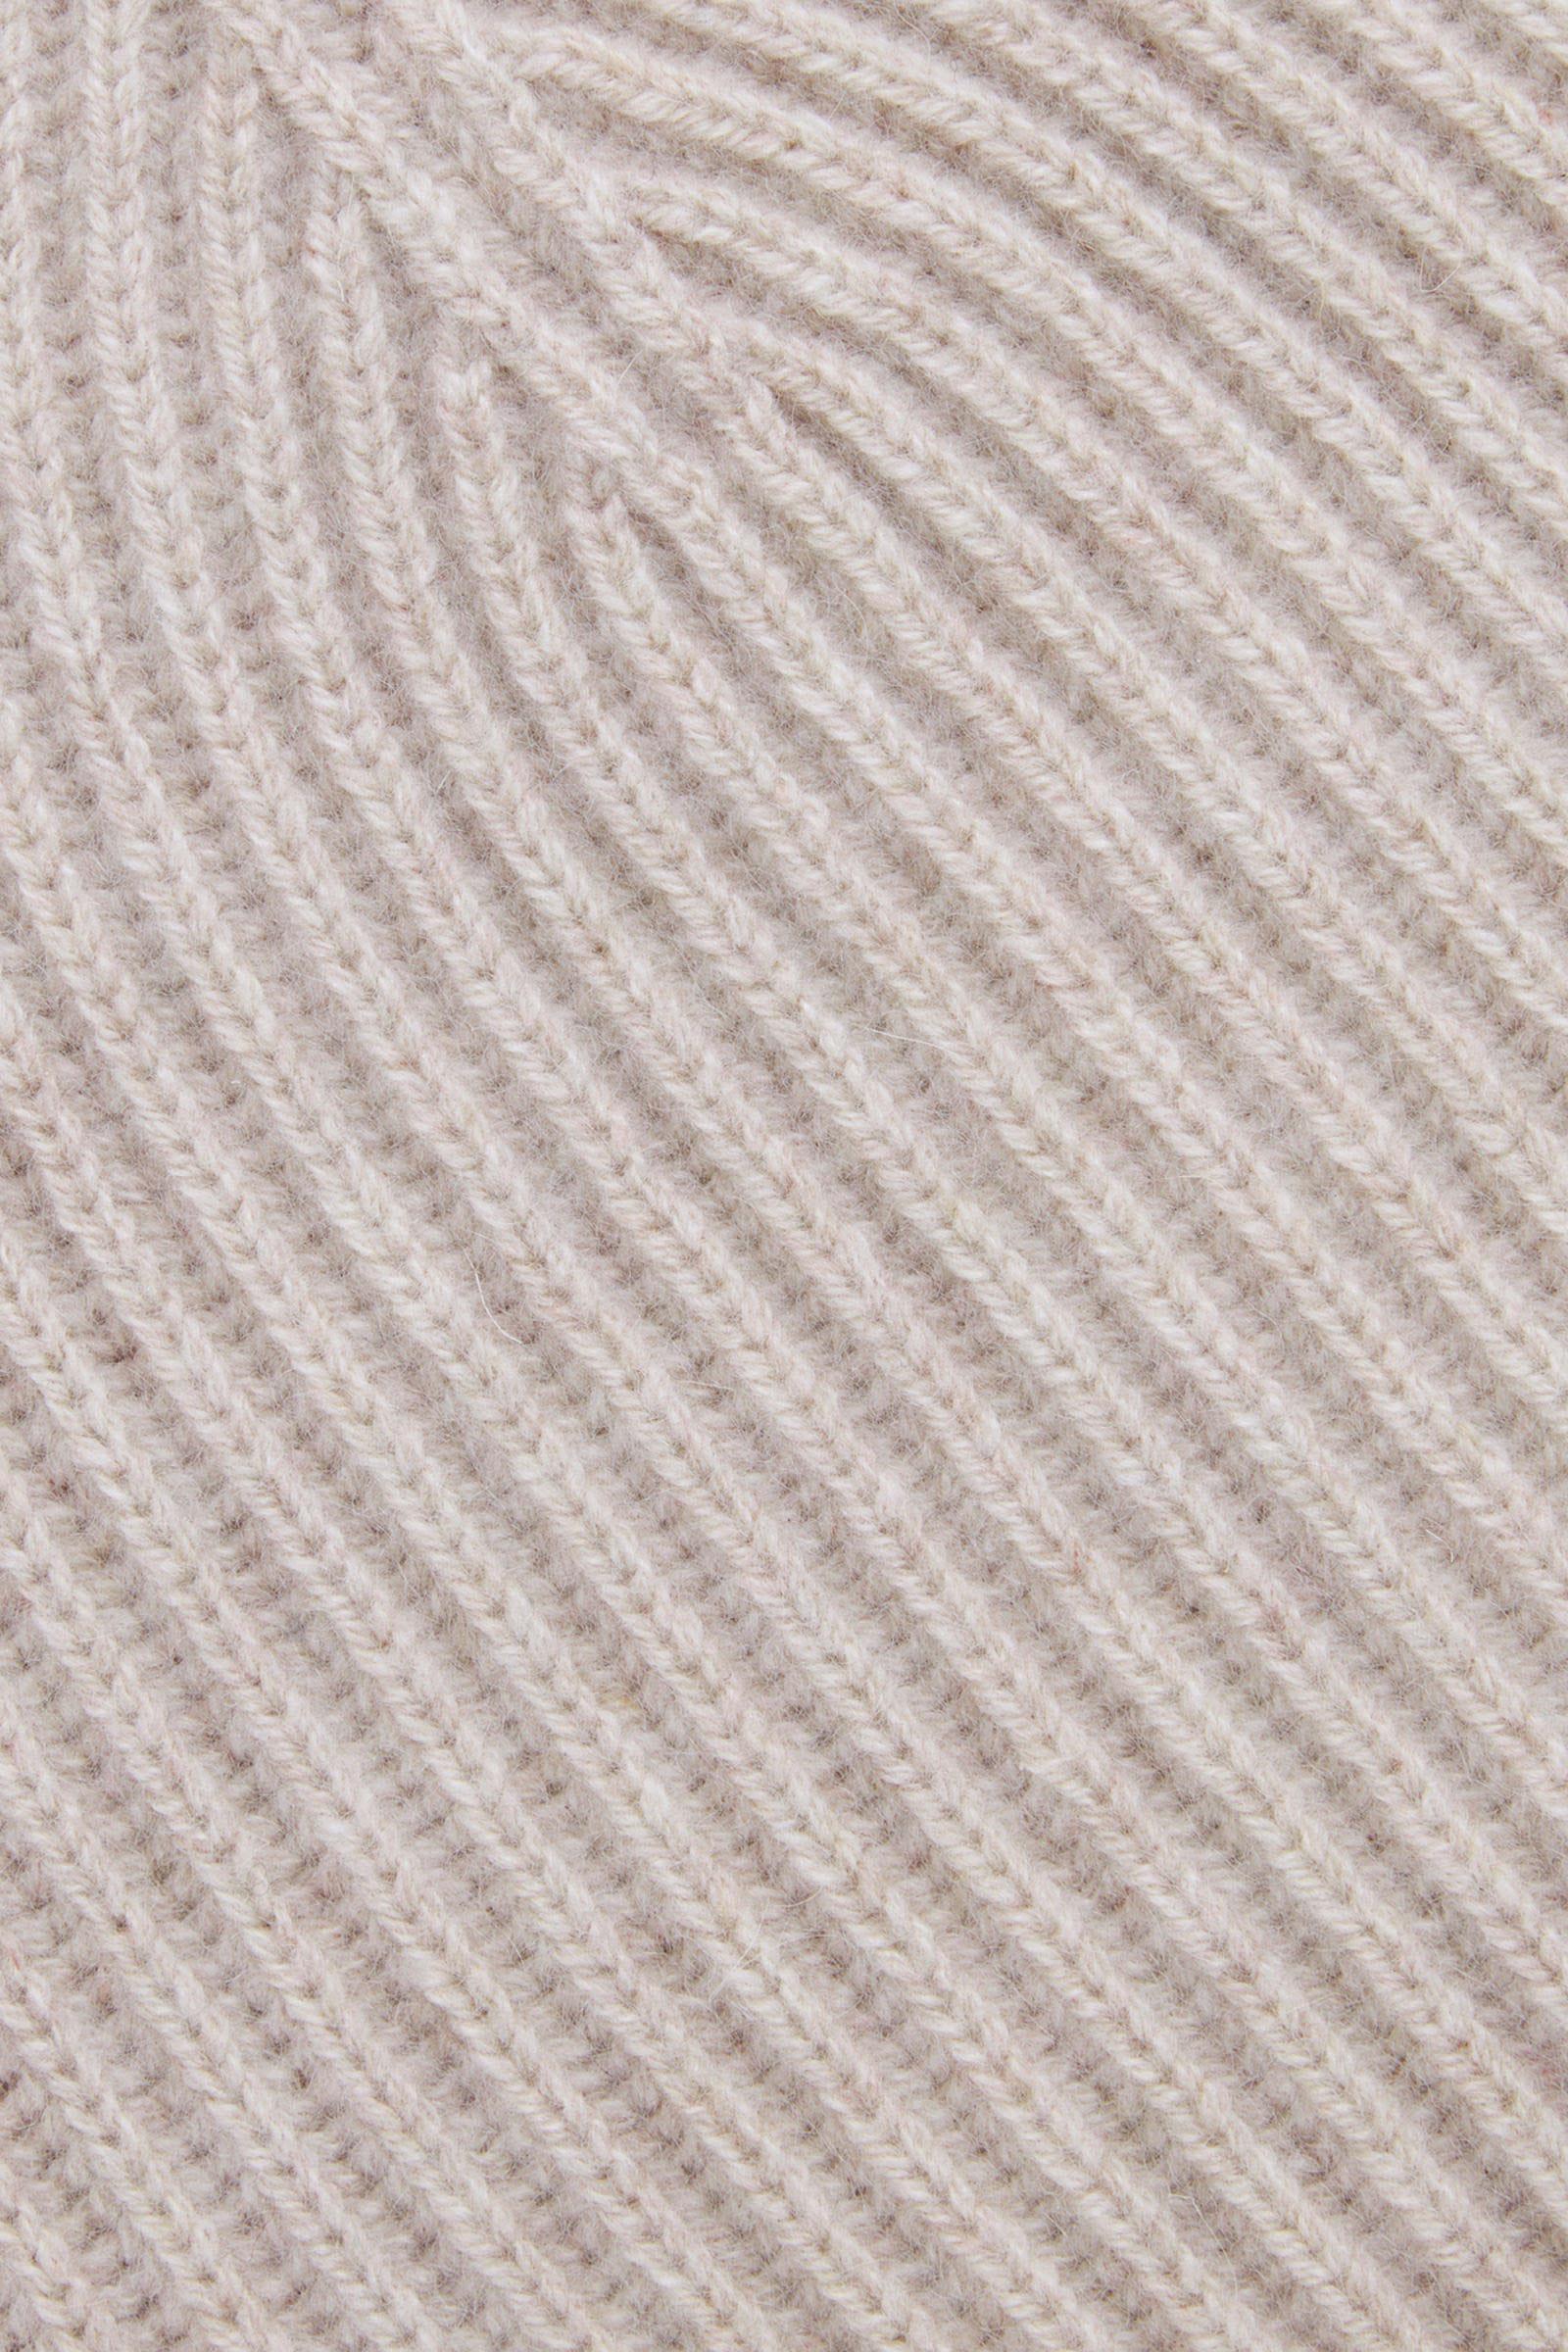 COS 리브드 캐시미어 햇의 오트밀컬러 Detail입니다.